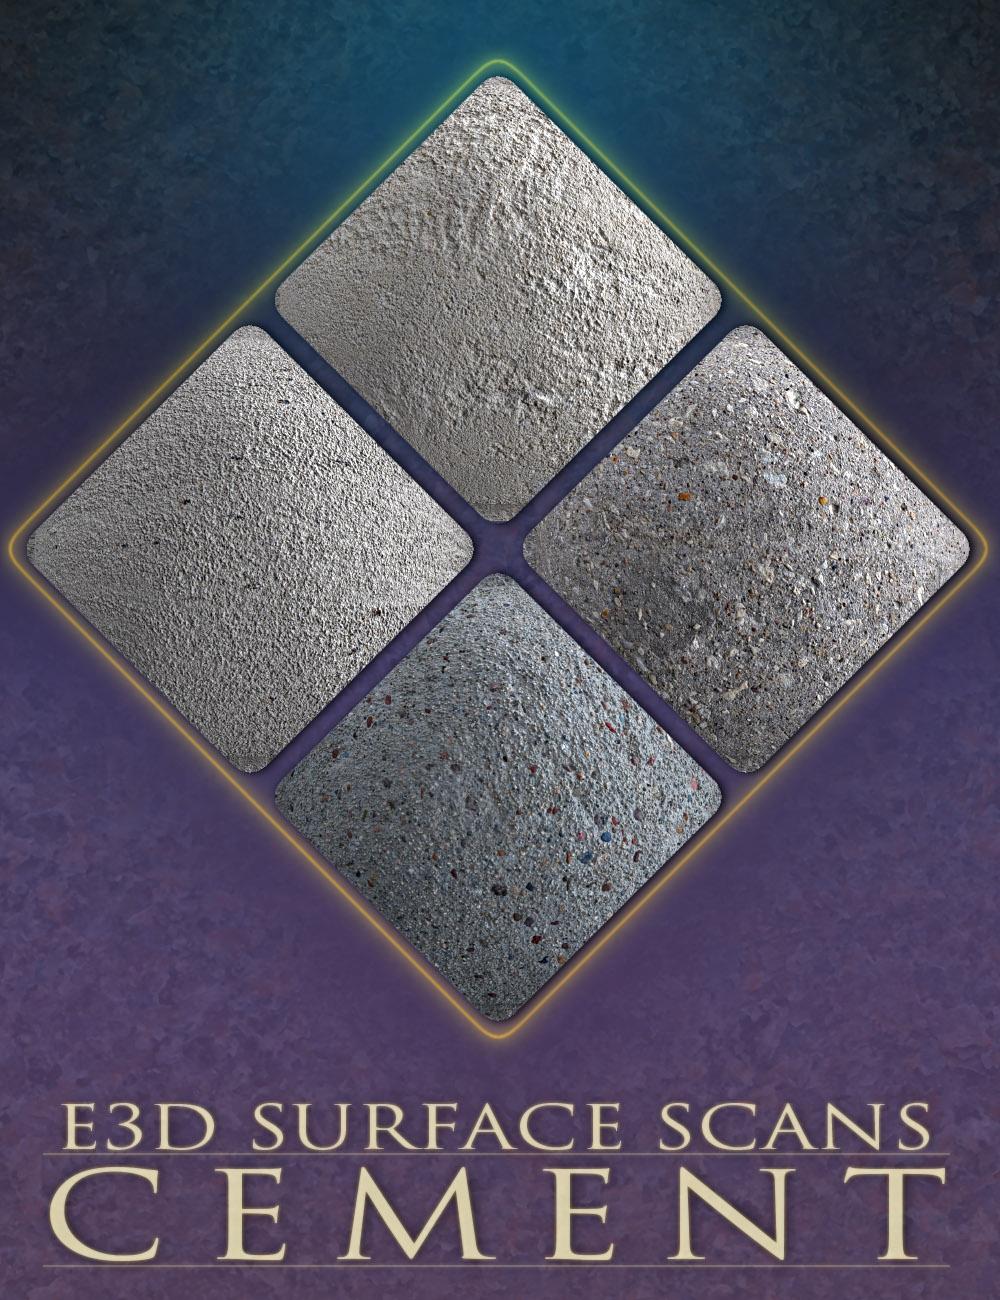 E3D Surface Scans - Cement Textures and Merchant Resource by: EcoManiac3D, 3D Models by Daz 3D